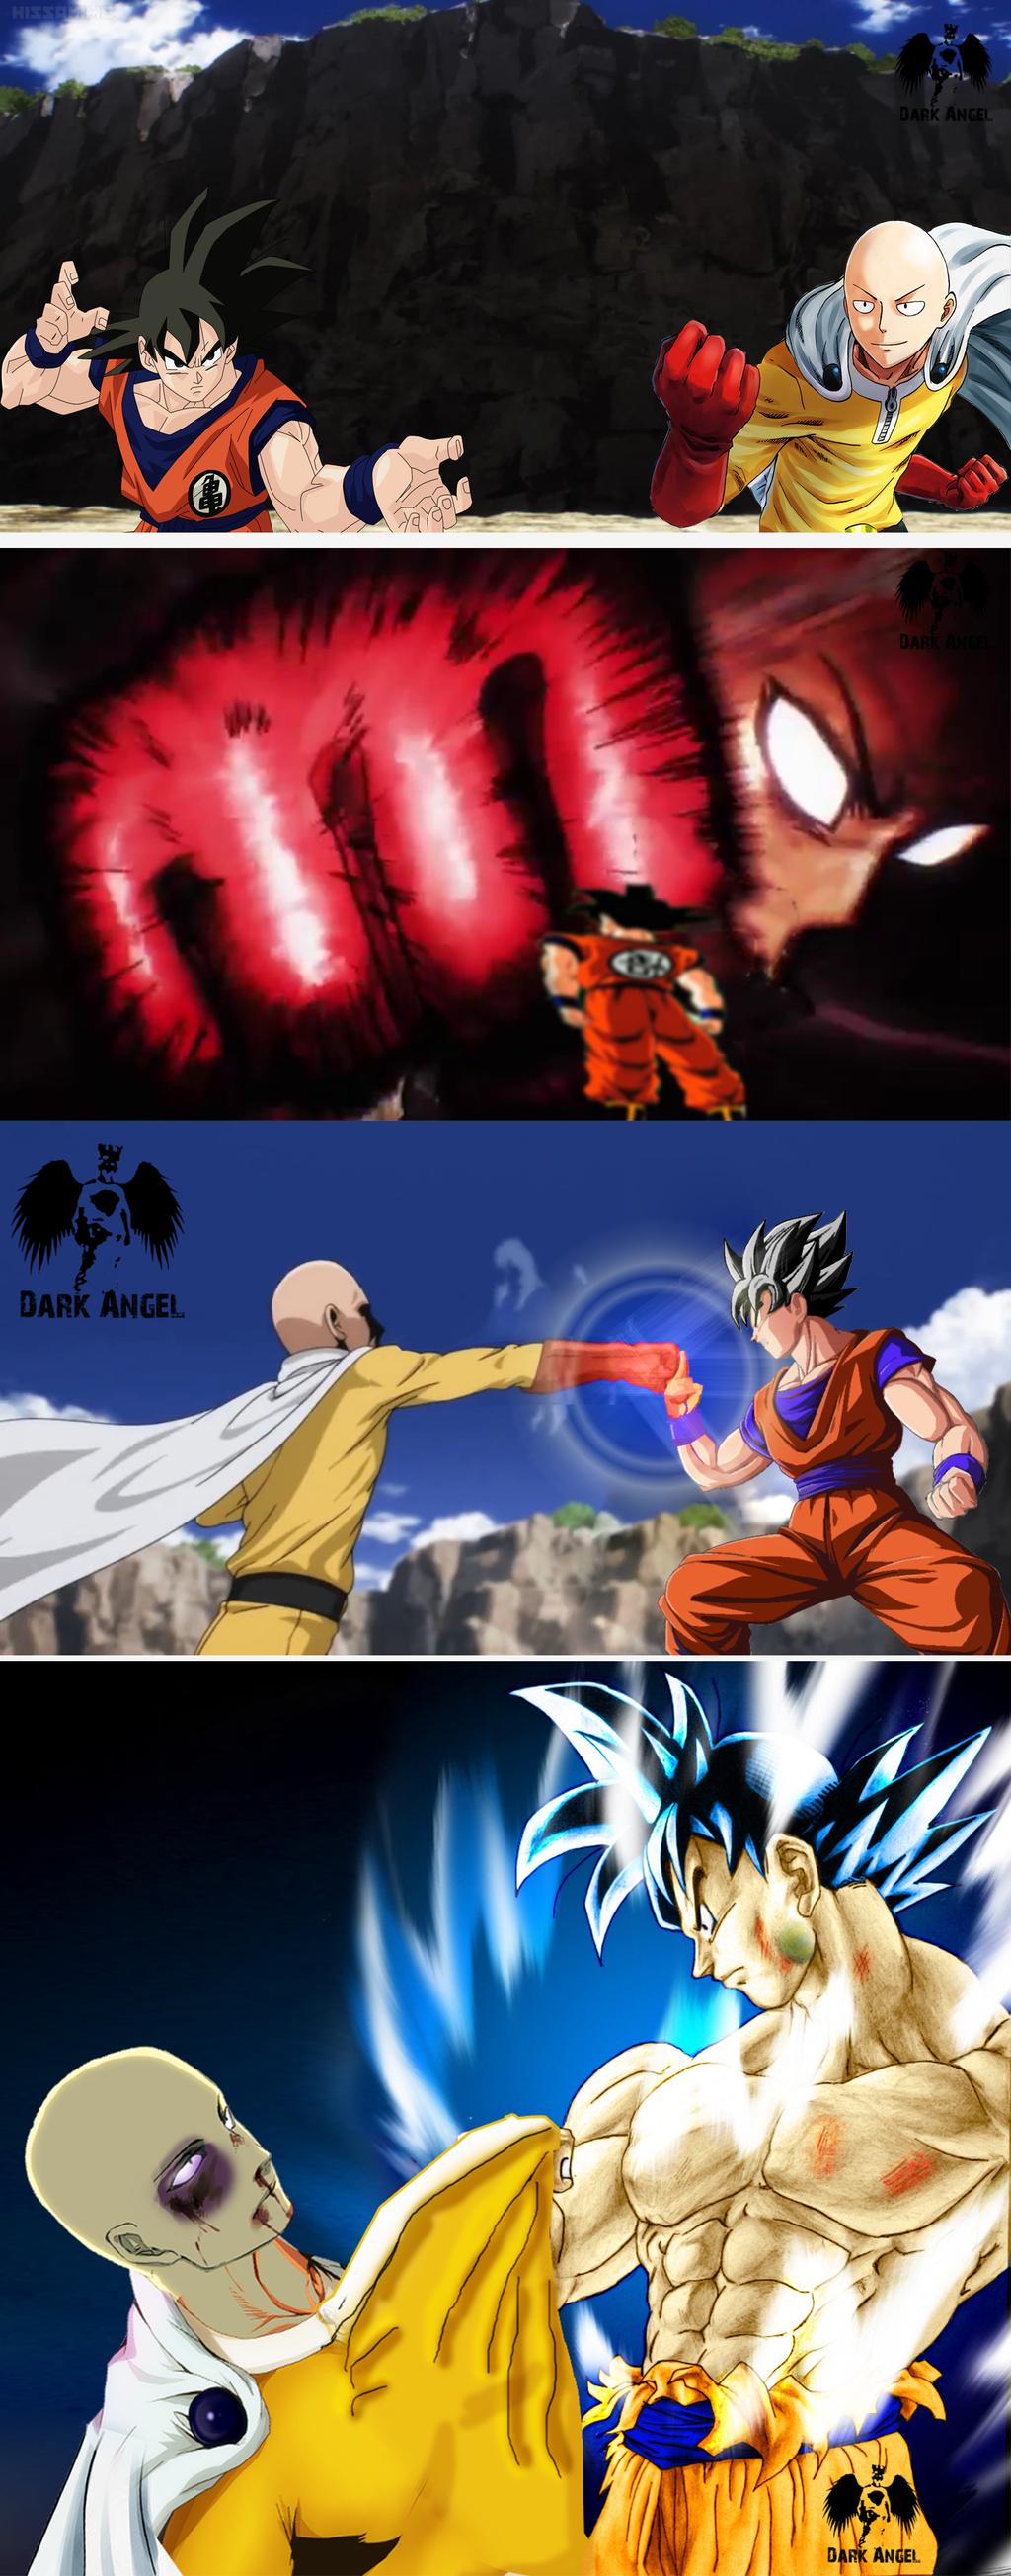 Goku vs One Punch Man by ArjunDarkangel on DeviantArt